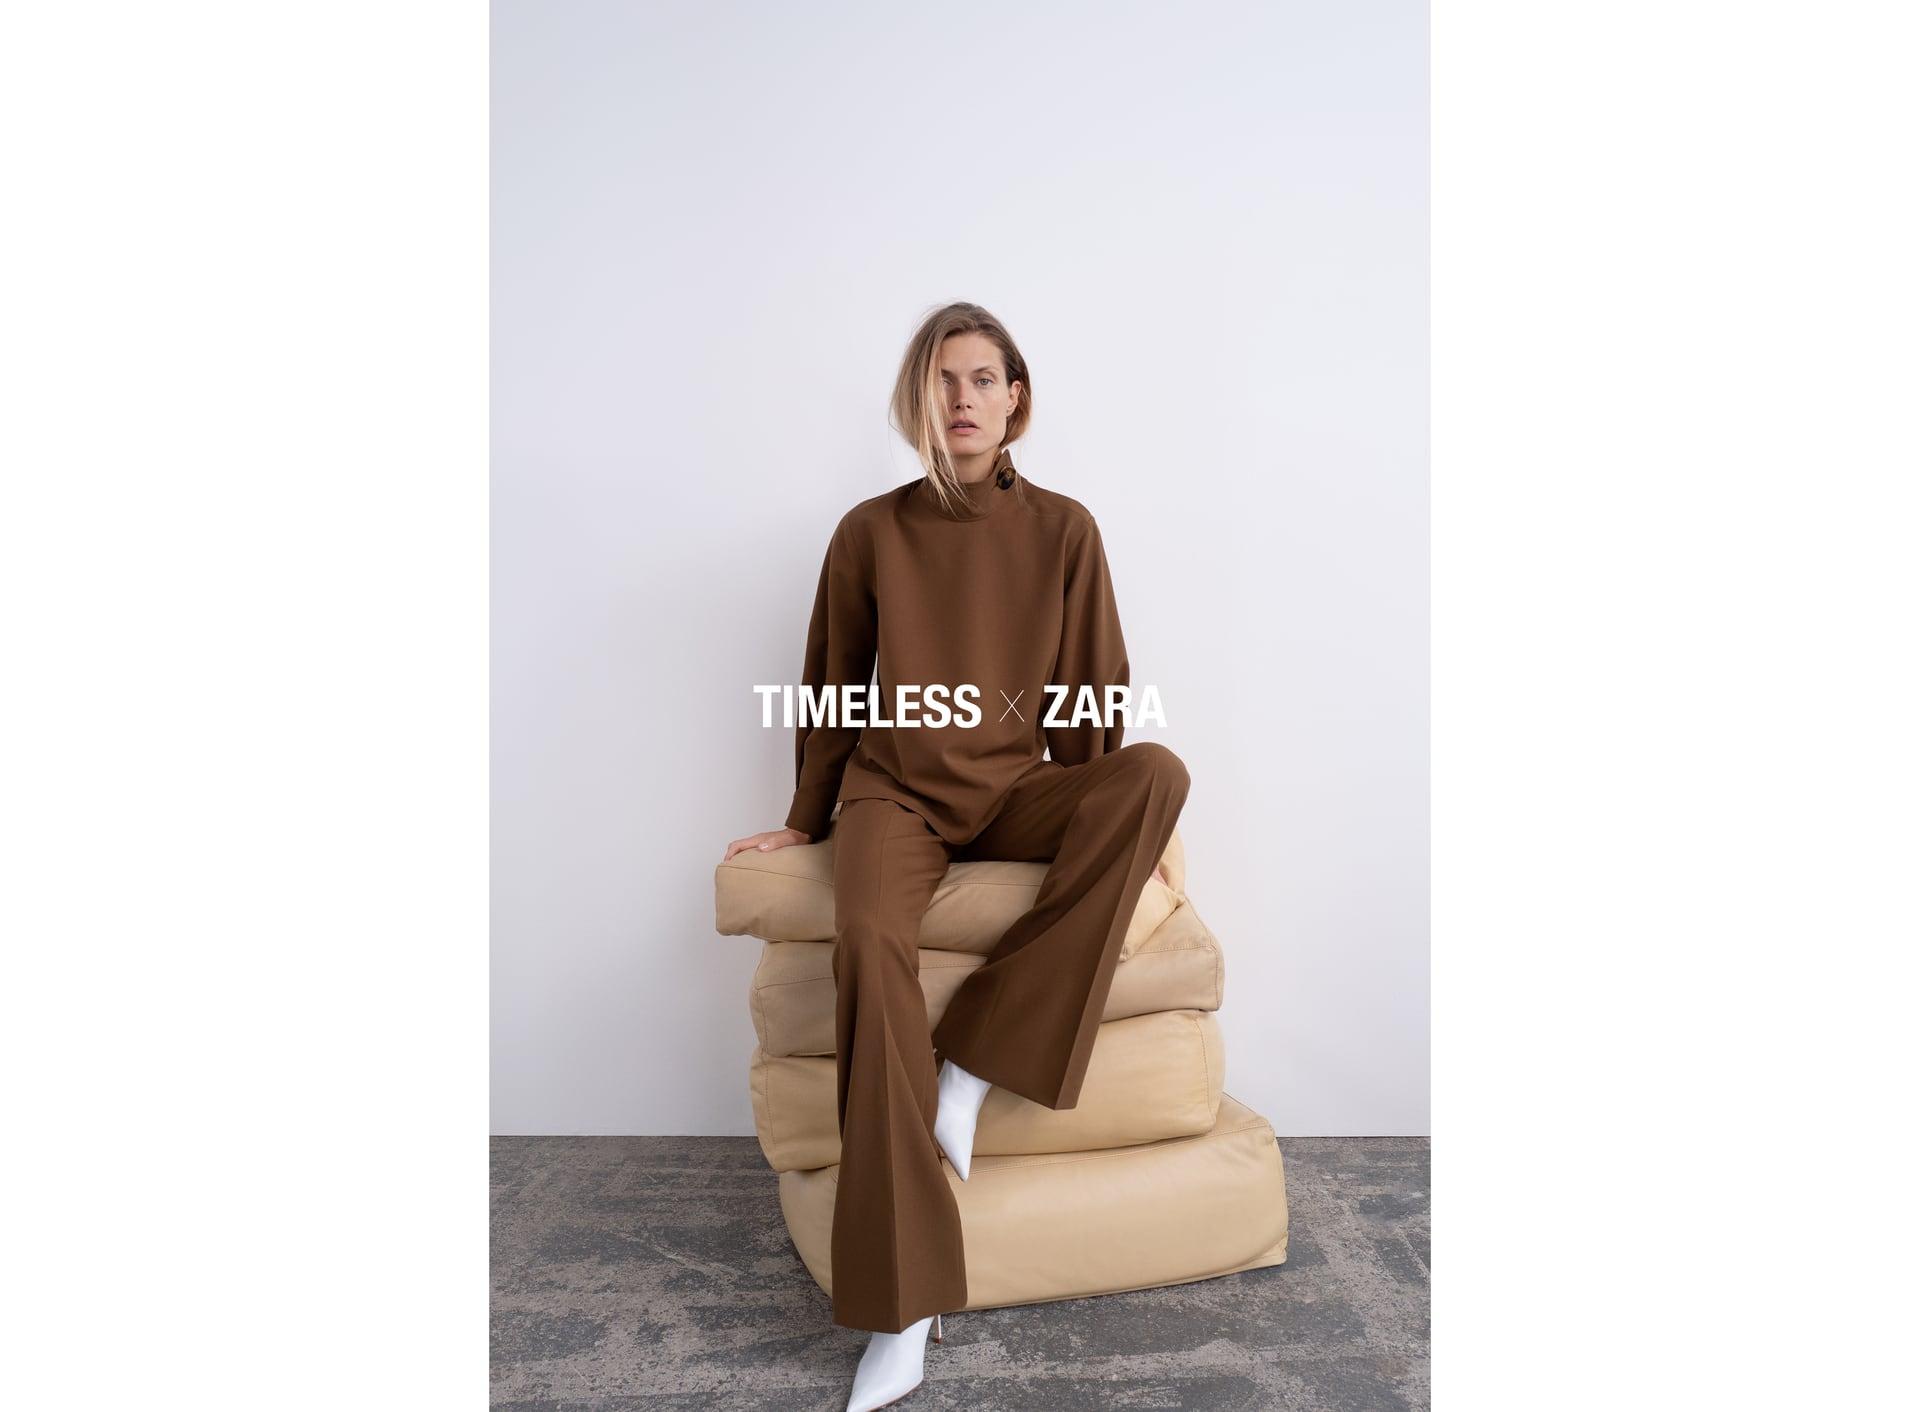 Catalogue Nouvelle collection Zara femme 2019